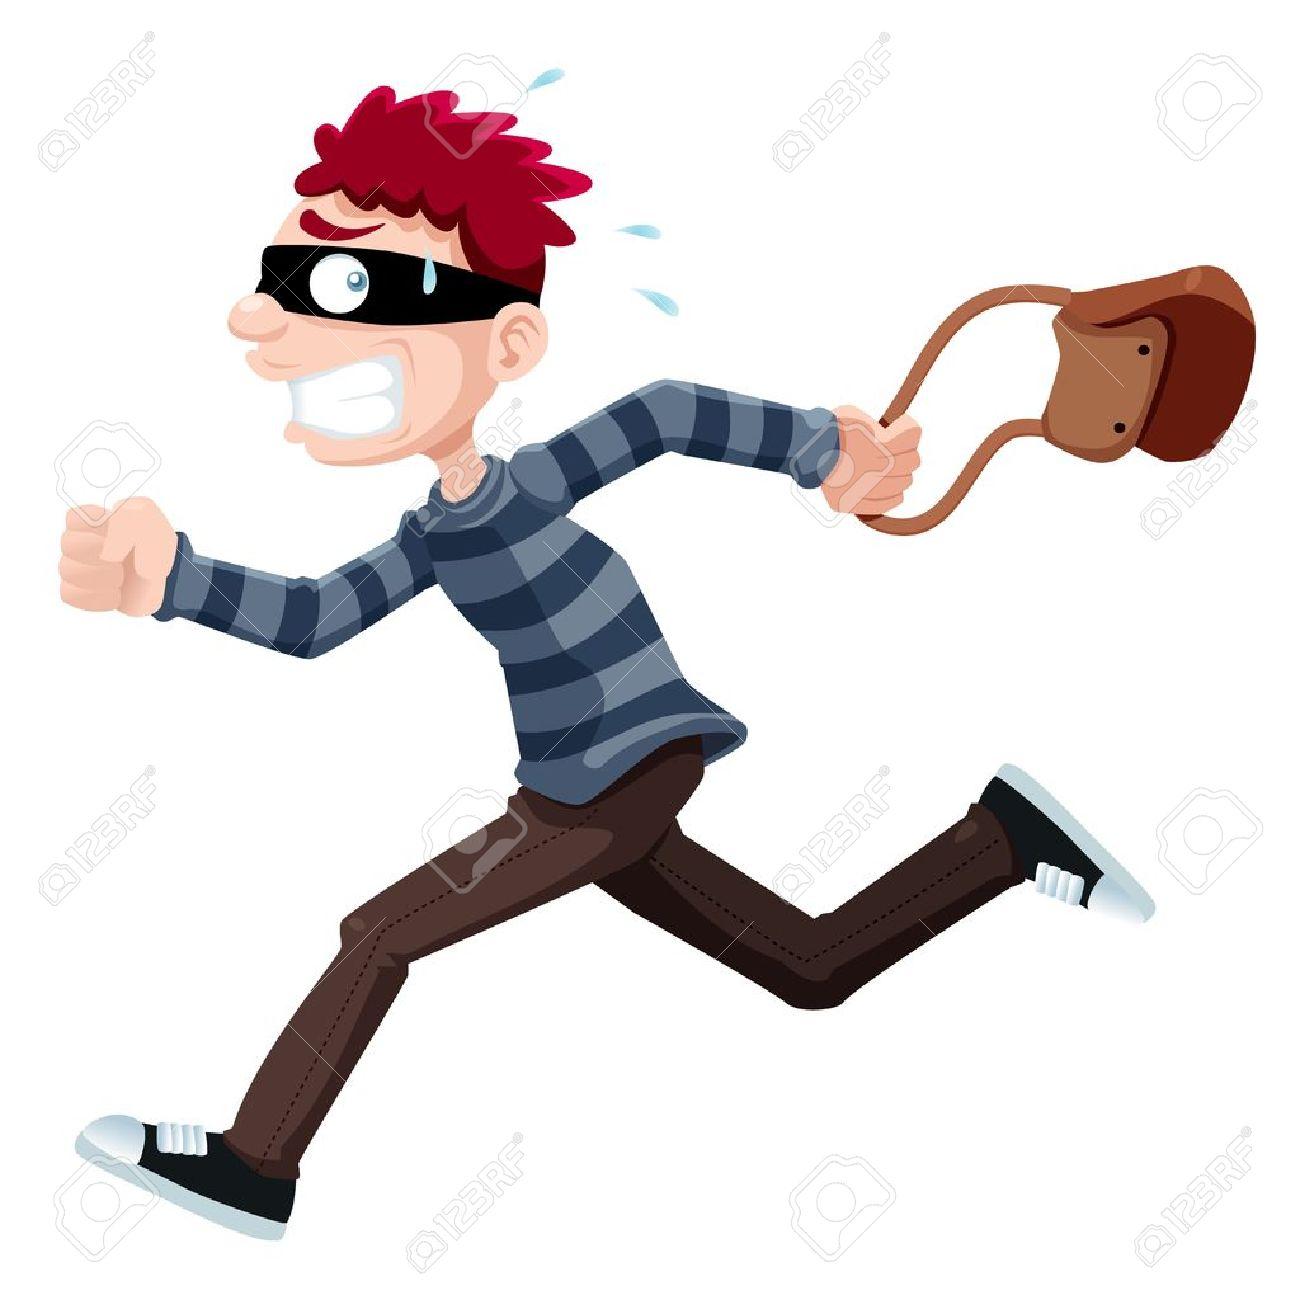 Cartoon Thief Running Illustration of Thief Running